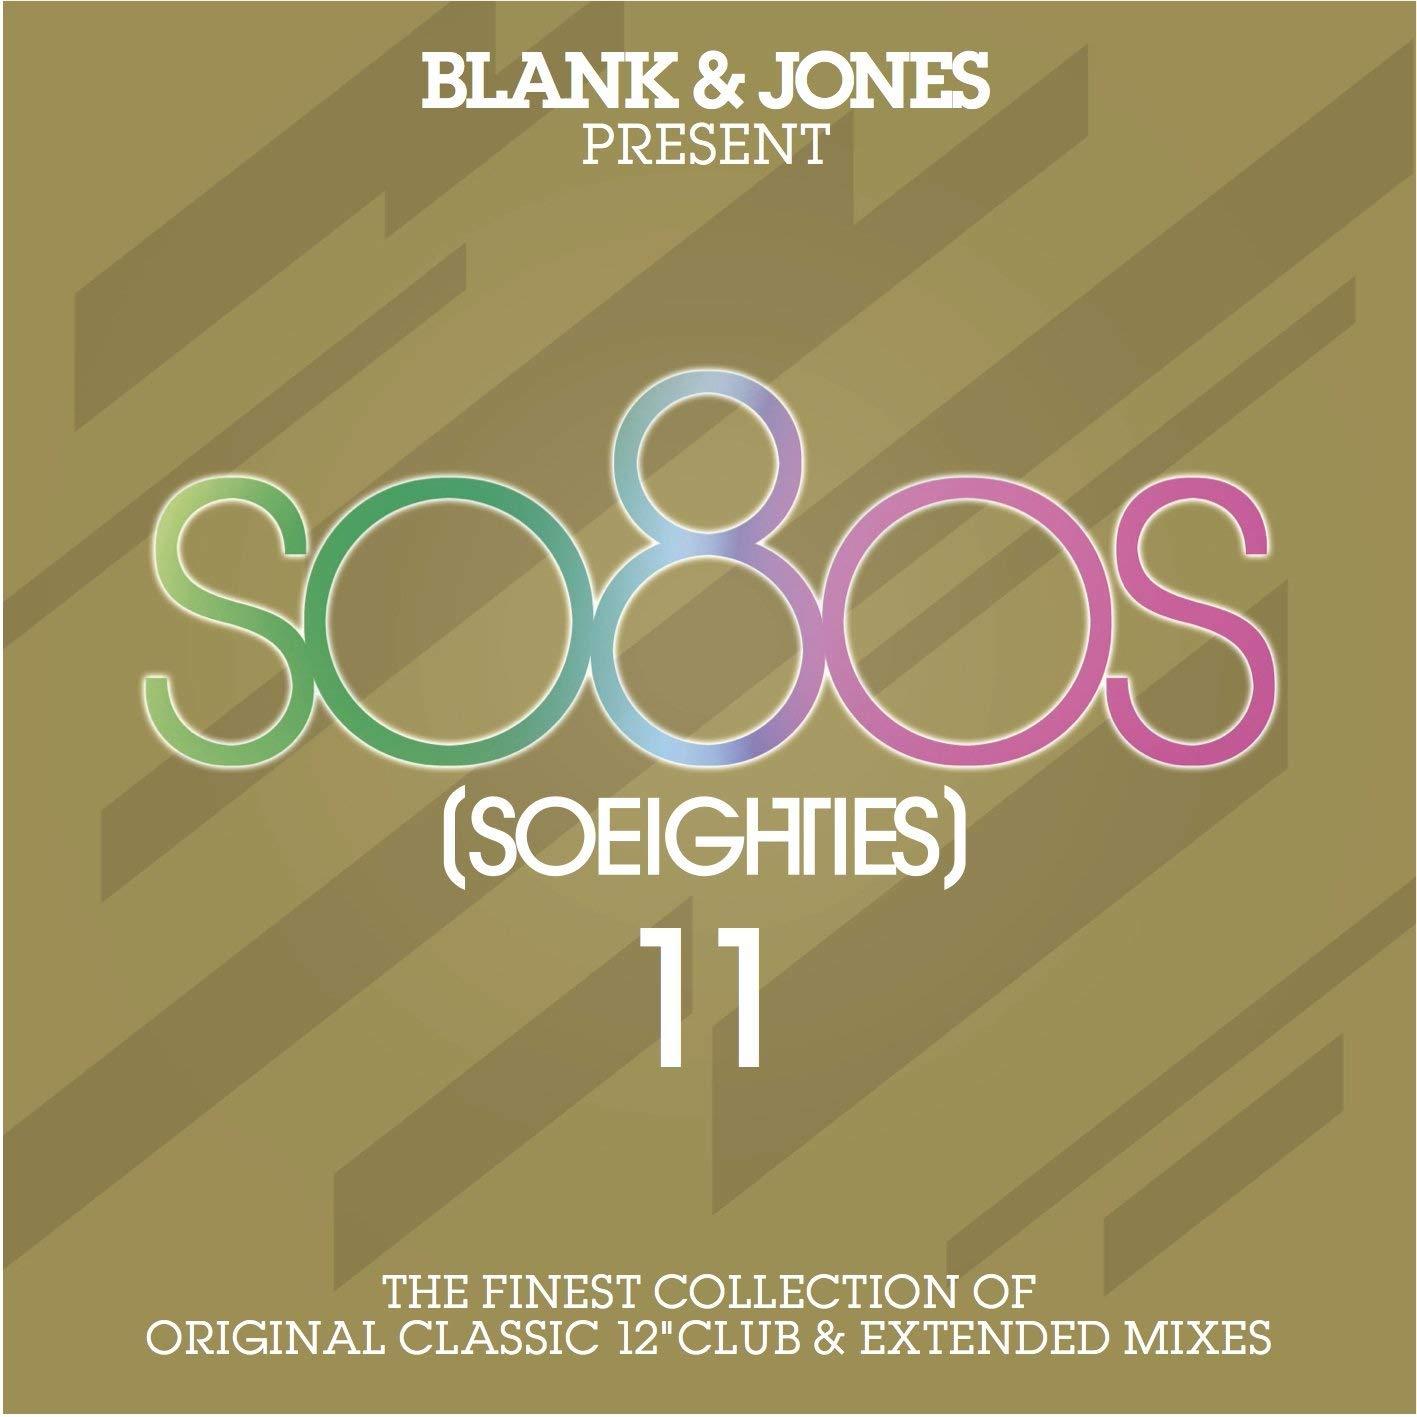 VA – Blank & Jones present so8os (SOEIGHTIES) 11 (2018) [FLAC]